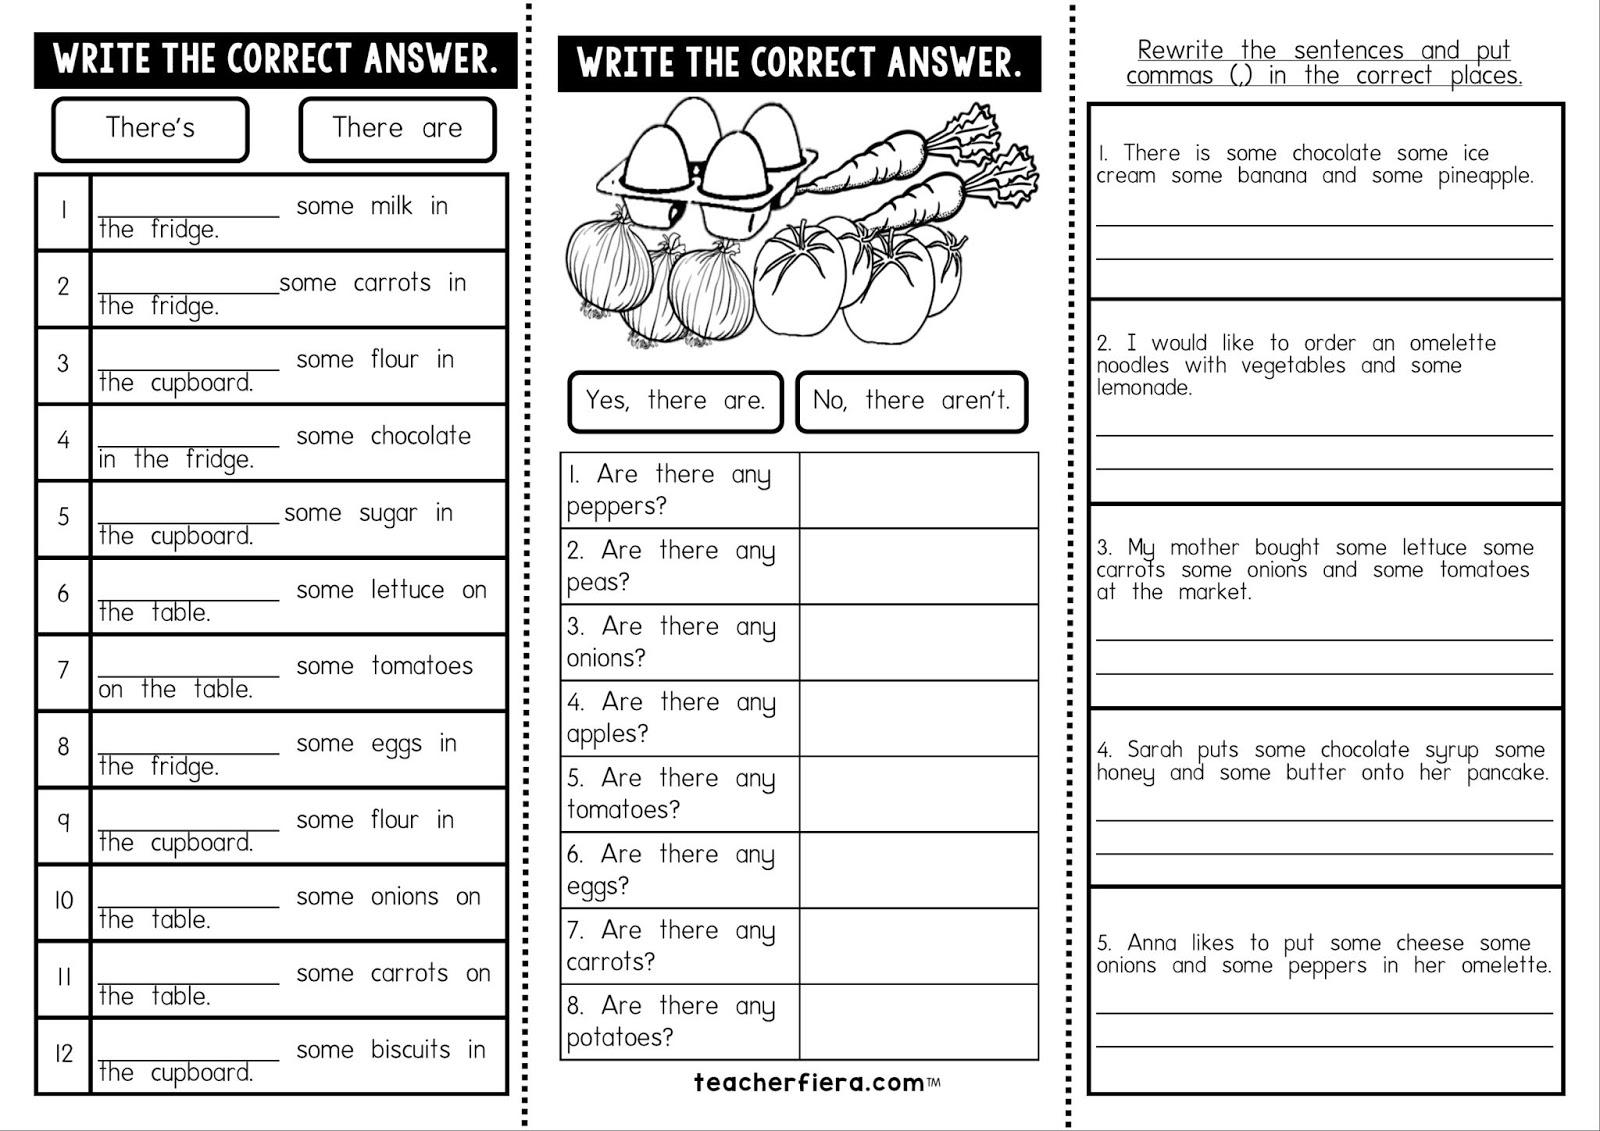 Teacherfiera Year 3 Module 6 Brochure Based On The